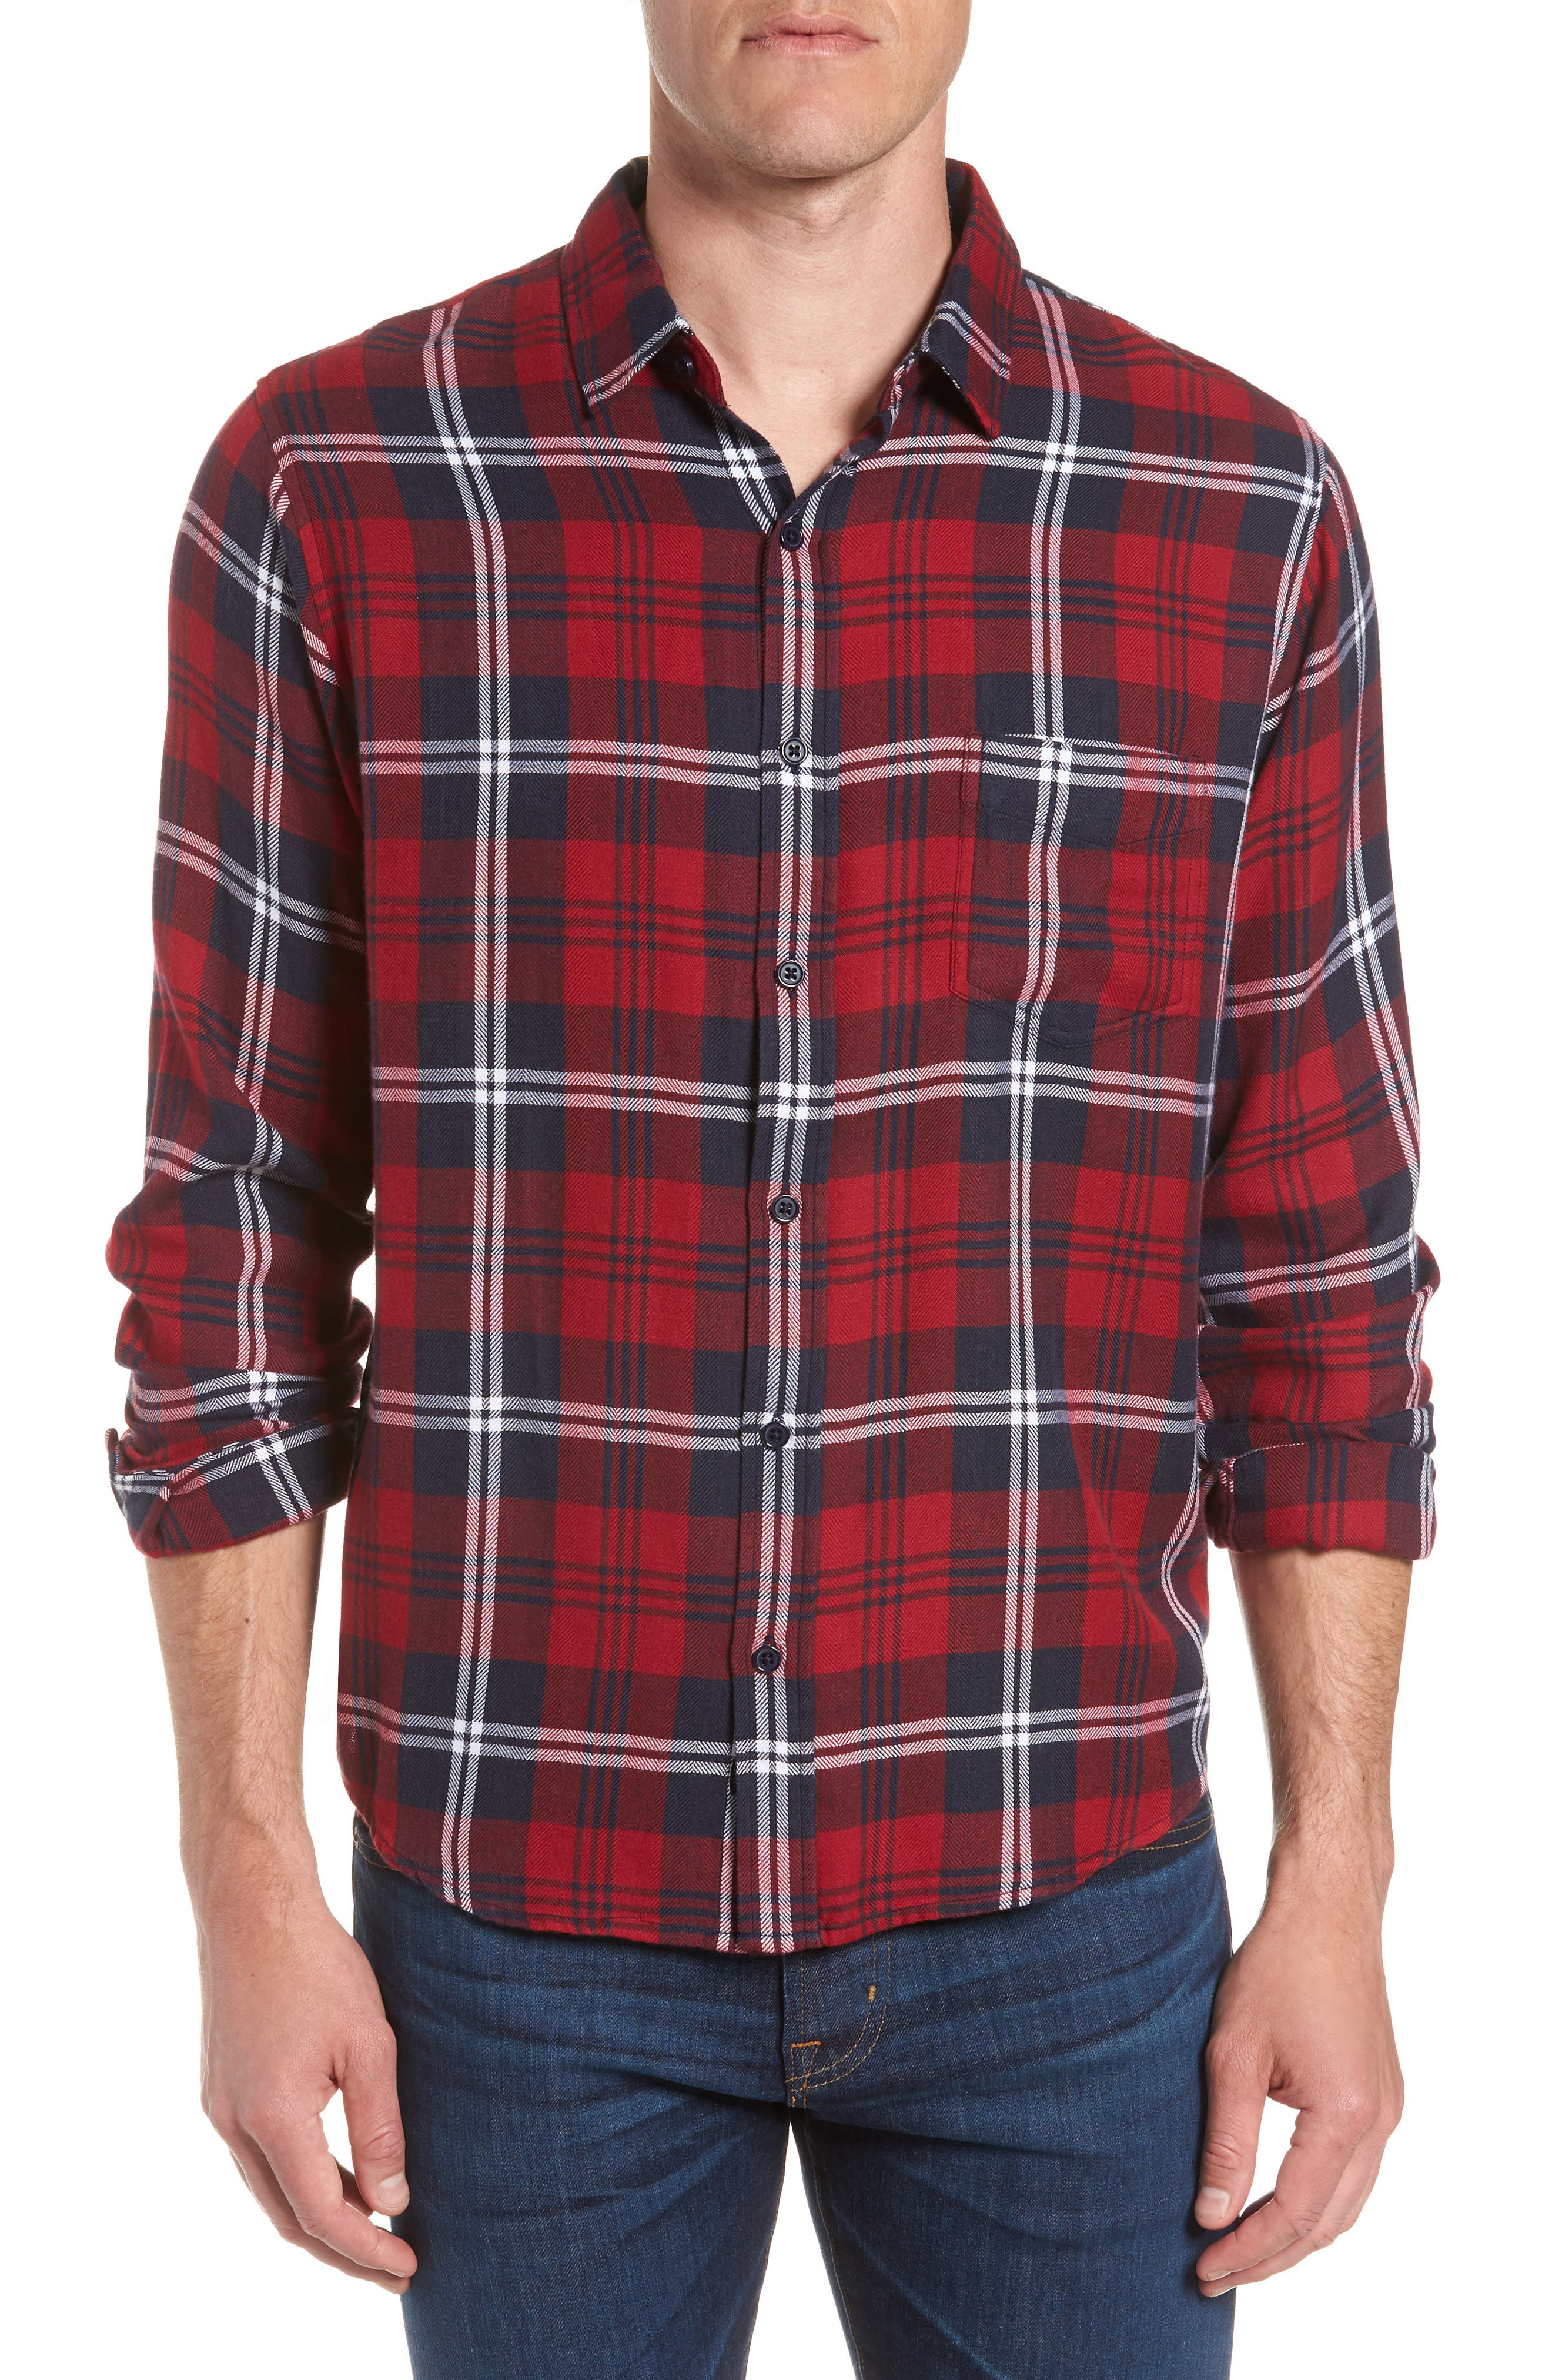 Lennox Sport Shirt,                             Main thumbnail 1, color,                             Red/ Navy/ White